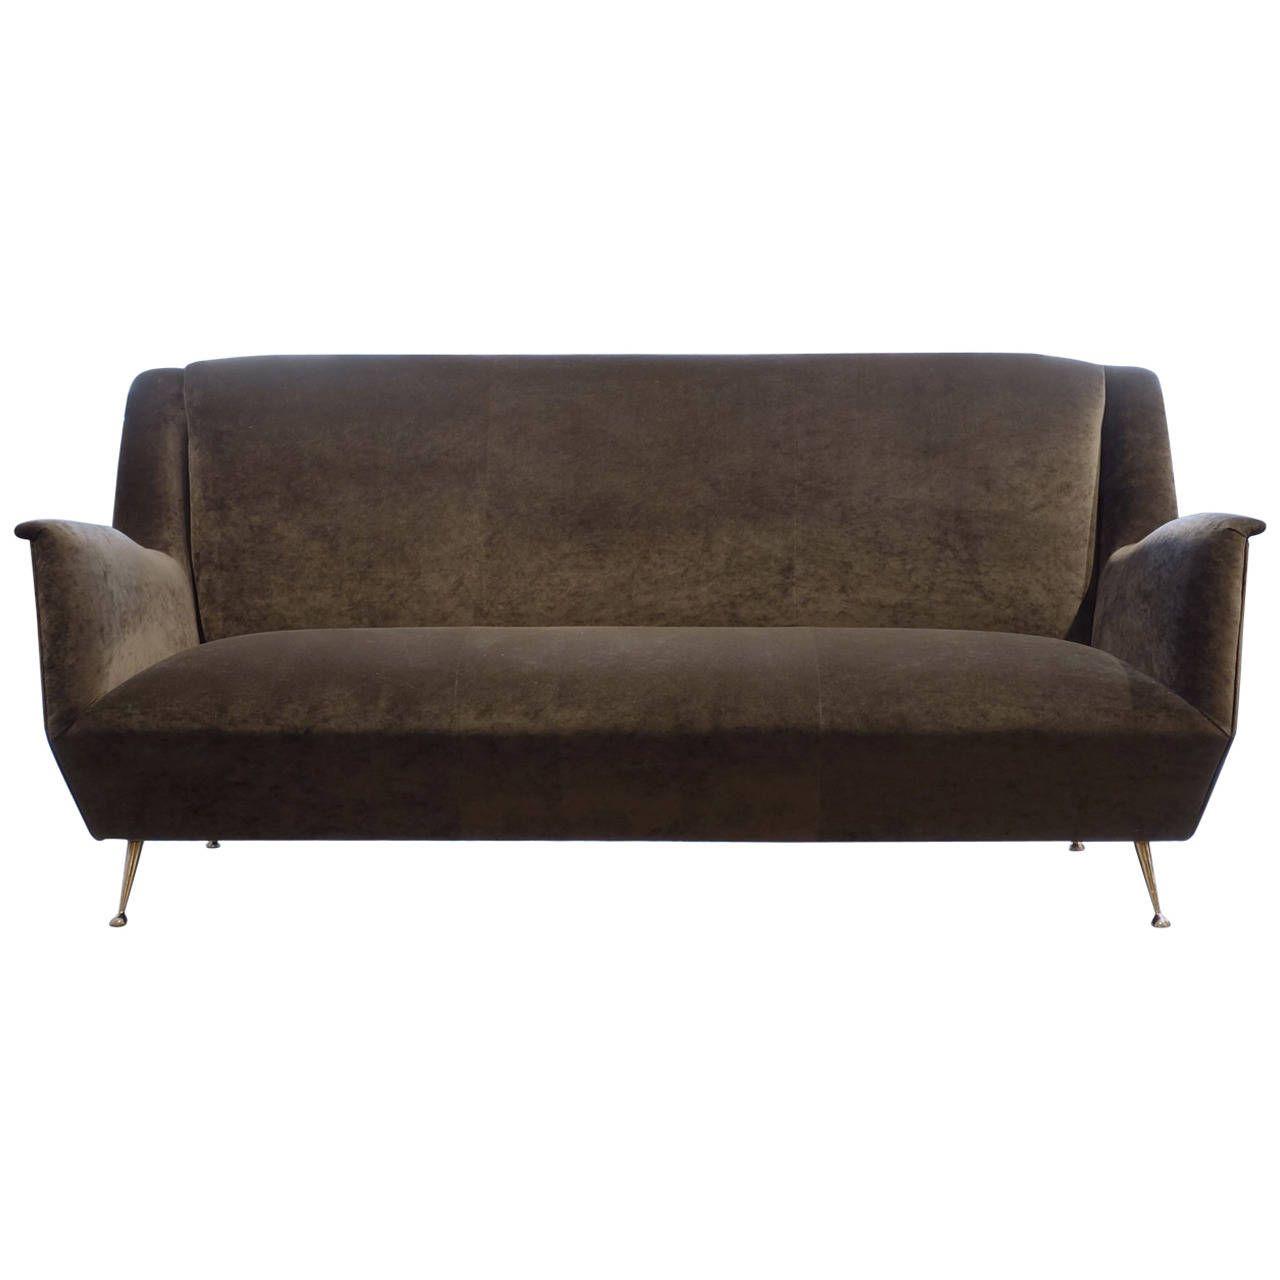 Italian Modern Three Seat Sofa | Sofa, Modern sofa, Modern